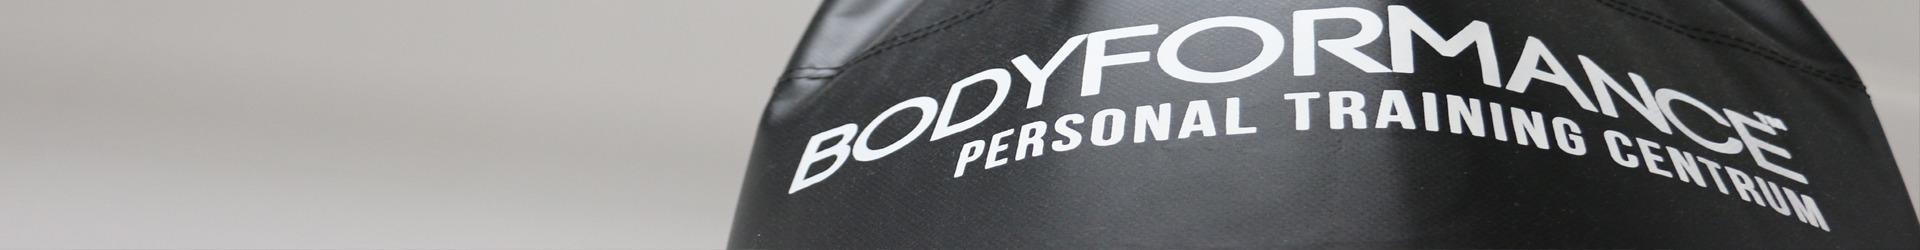 personal training centrum bodyformance